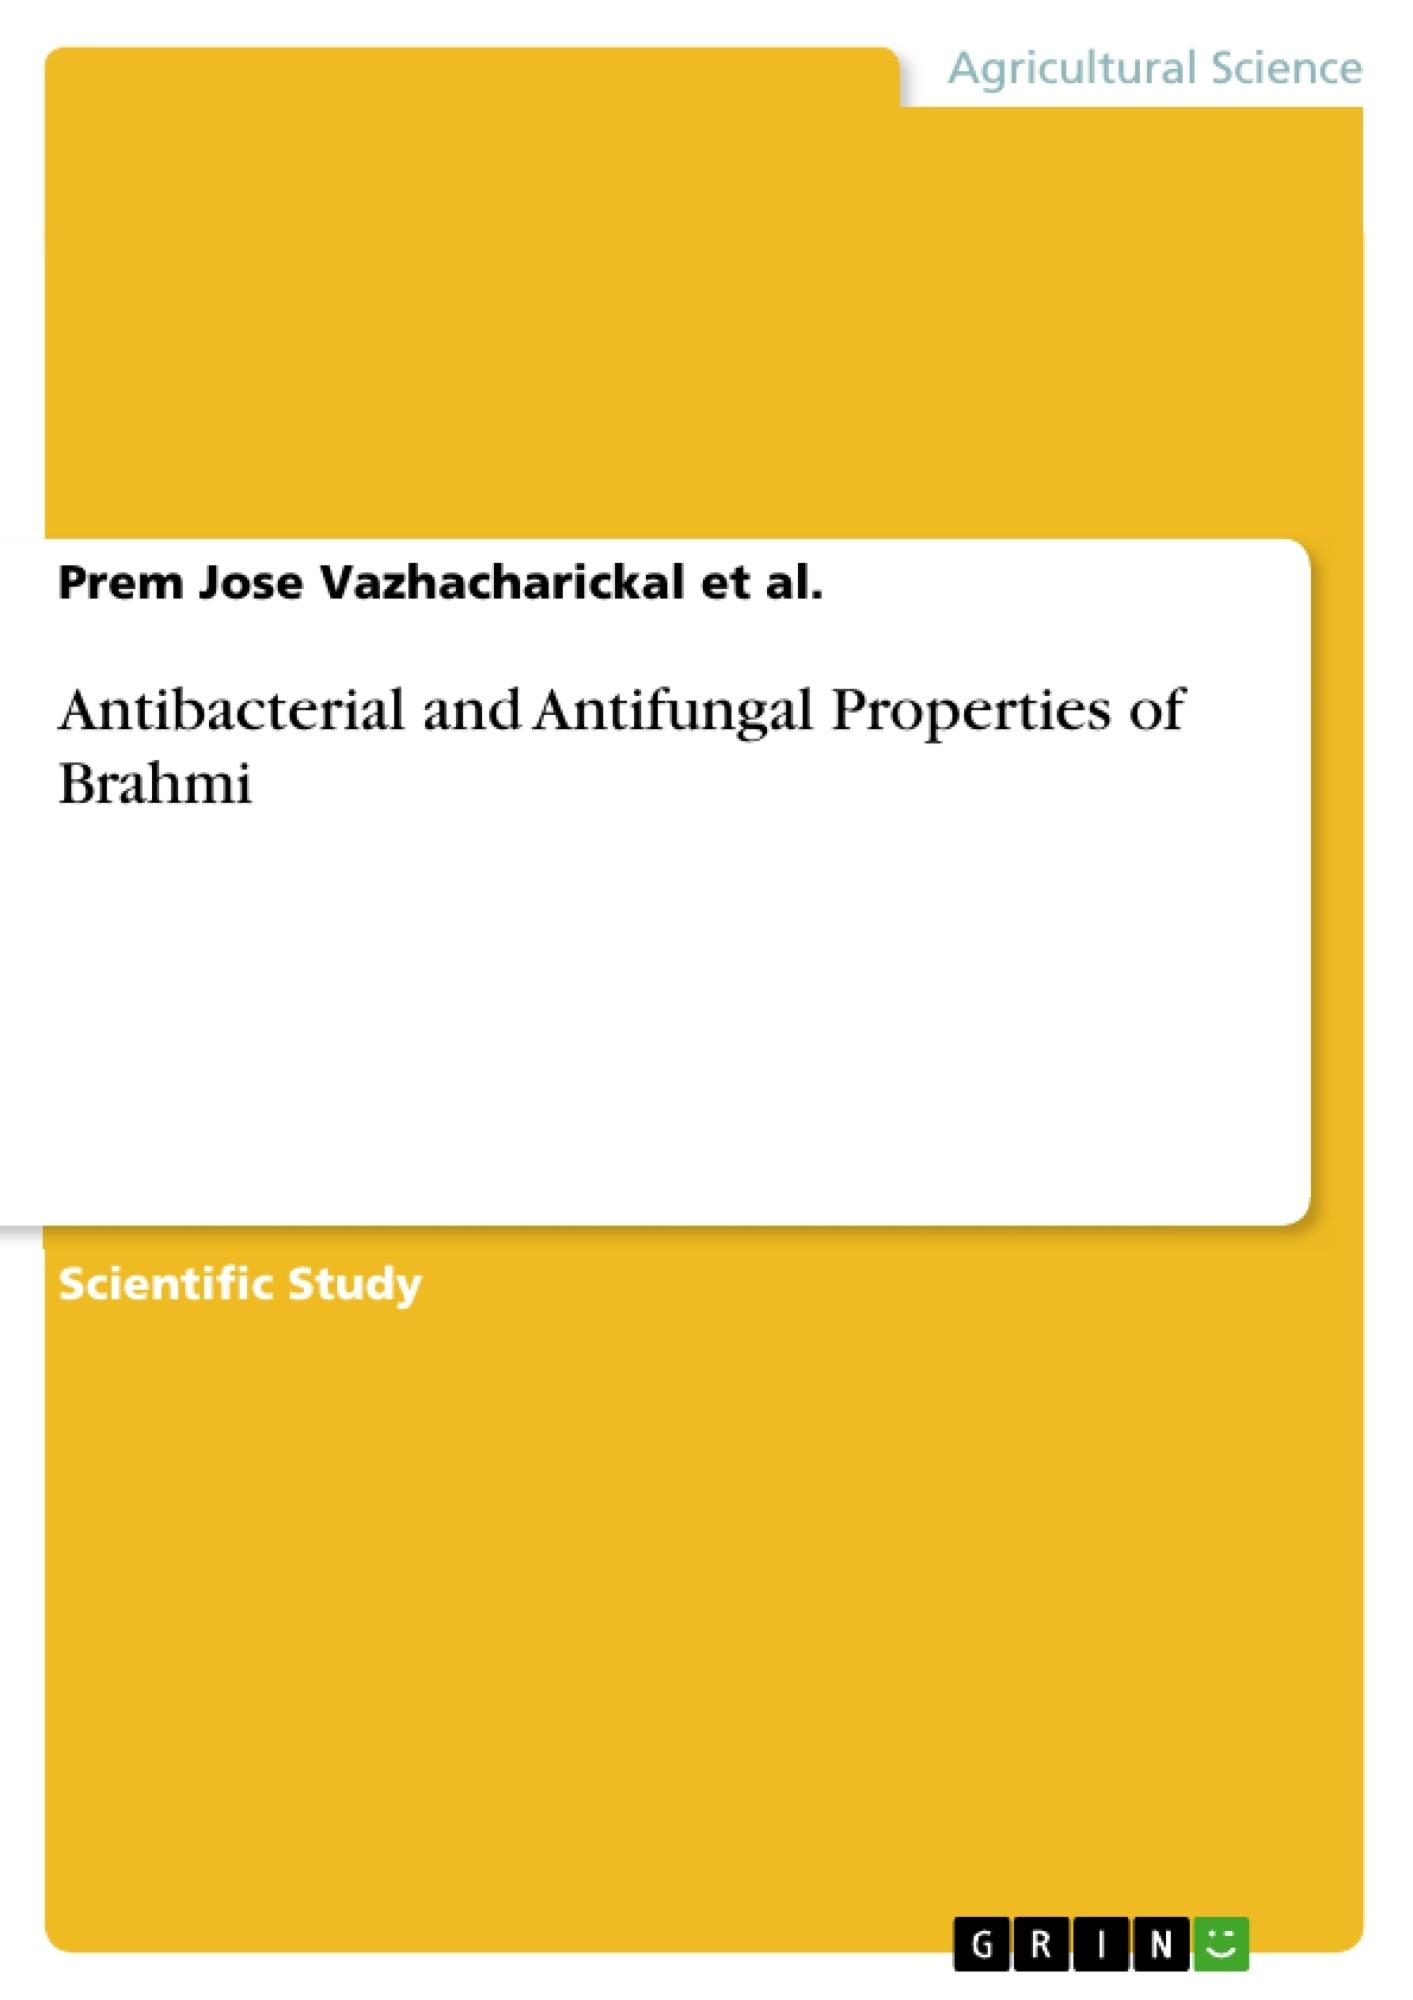 Title: Antibacterial and Antifungal Properties of Brahmi